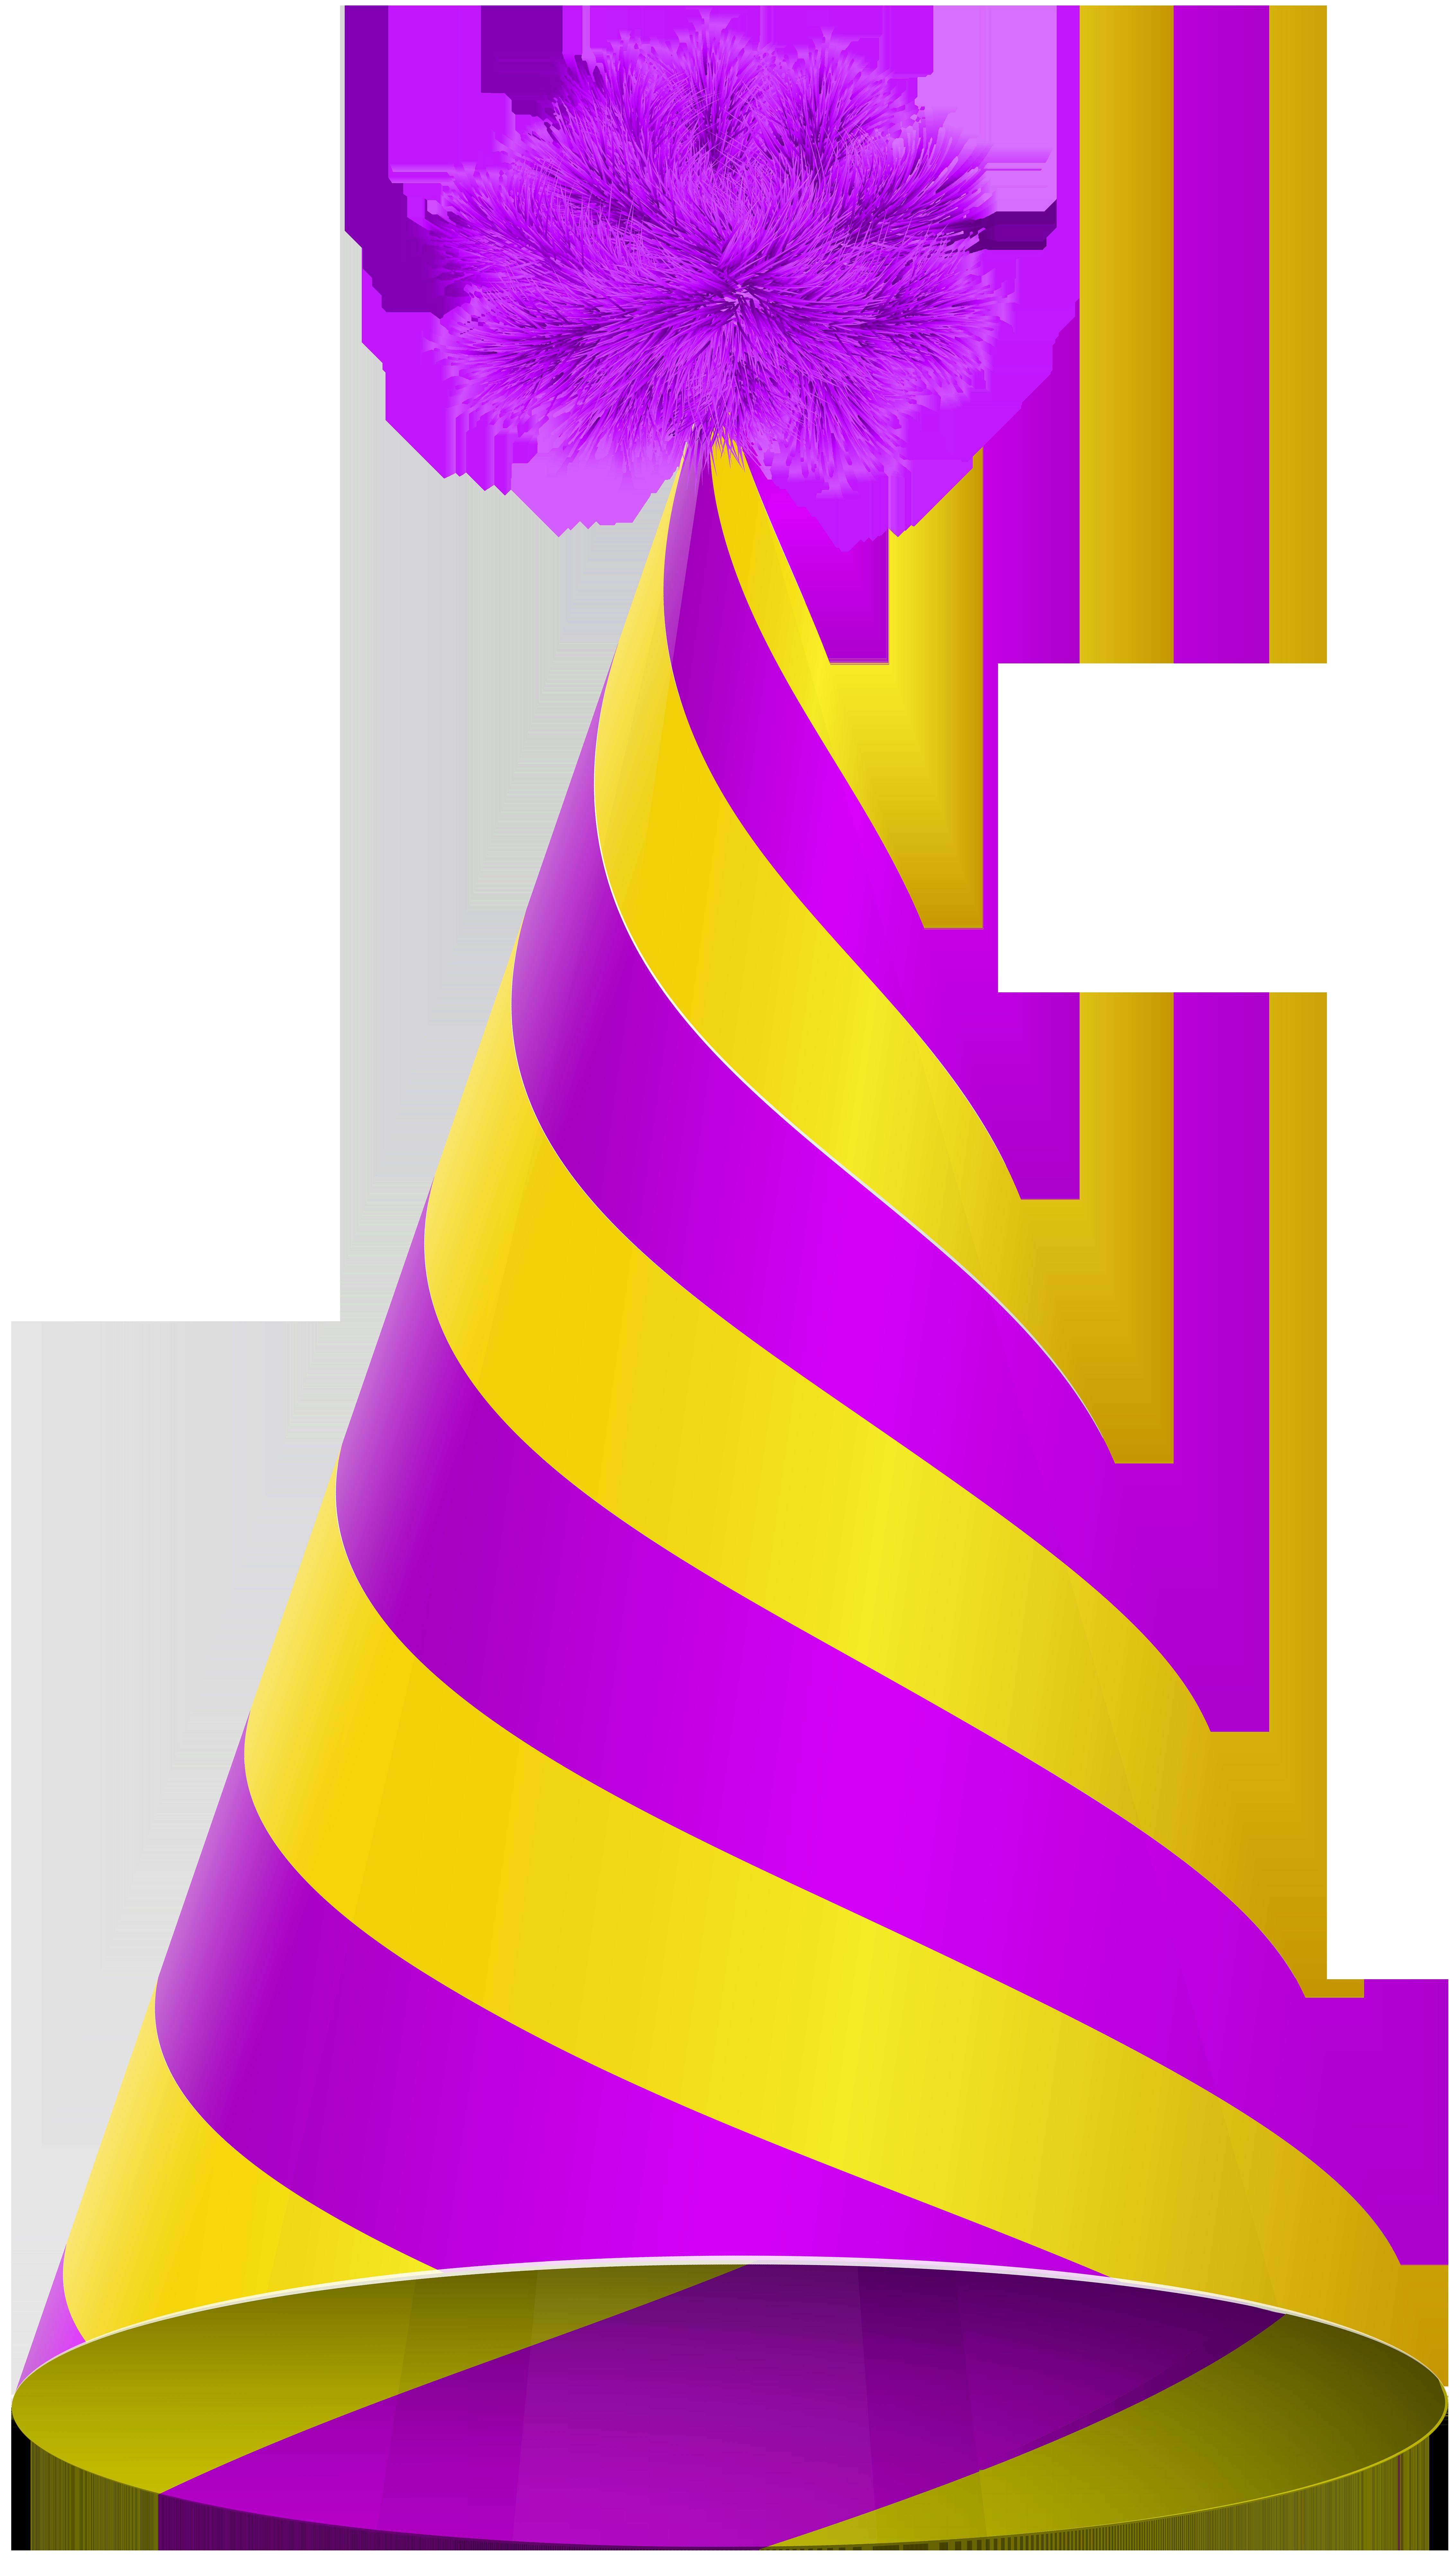 4533x8000 Party Hat Purple Yellow Transparent Png Clip Art Imageu200b Gallery